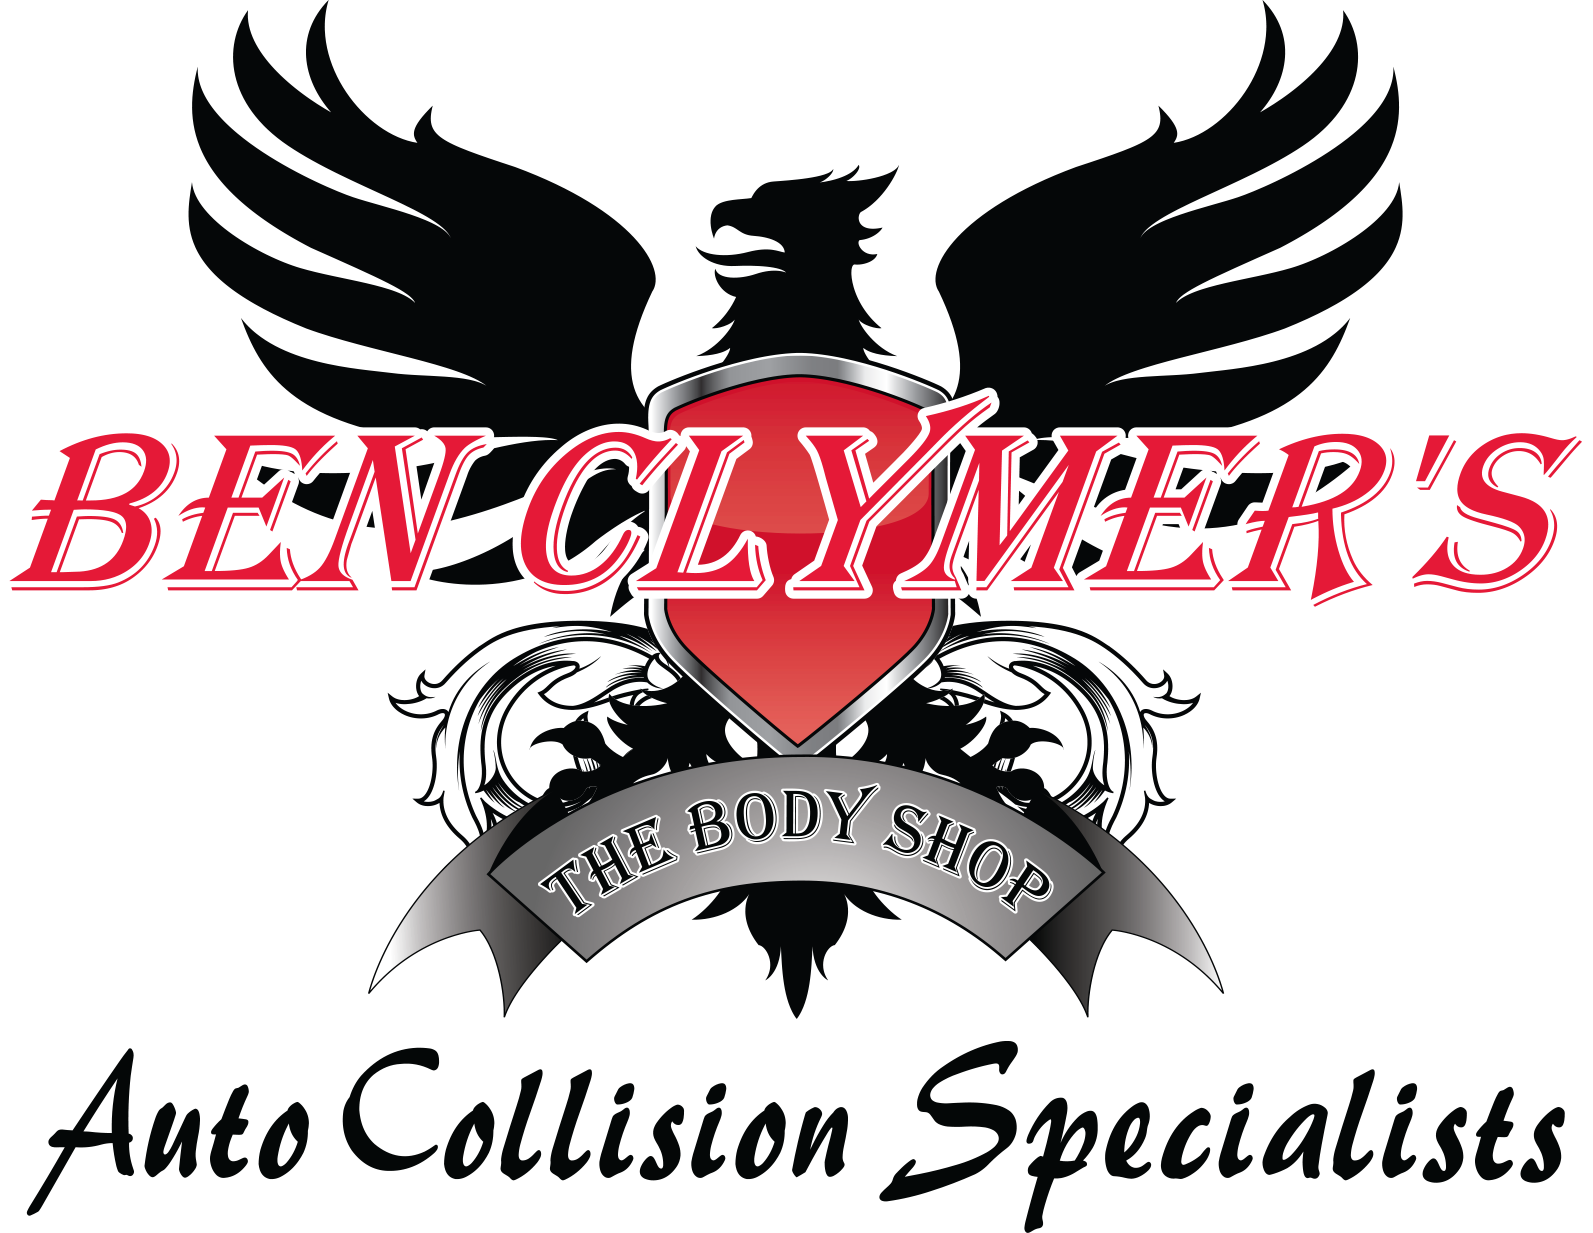 Ben Clymer's